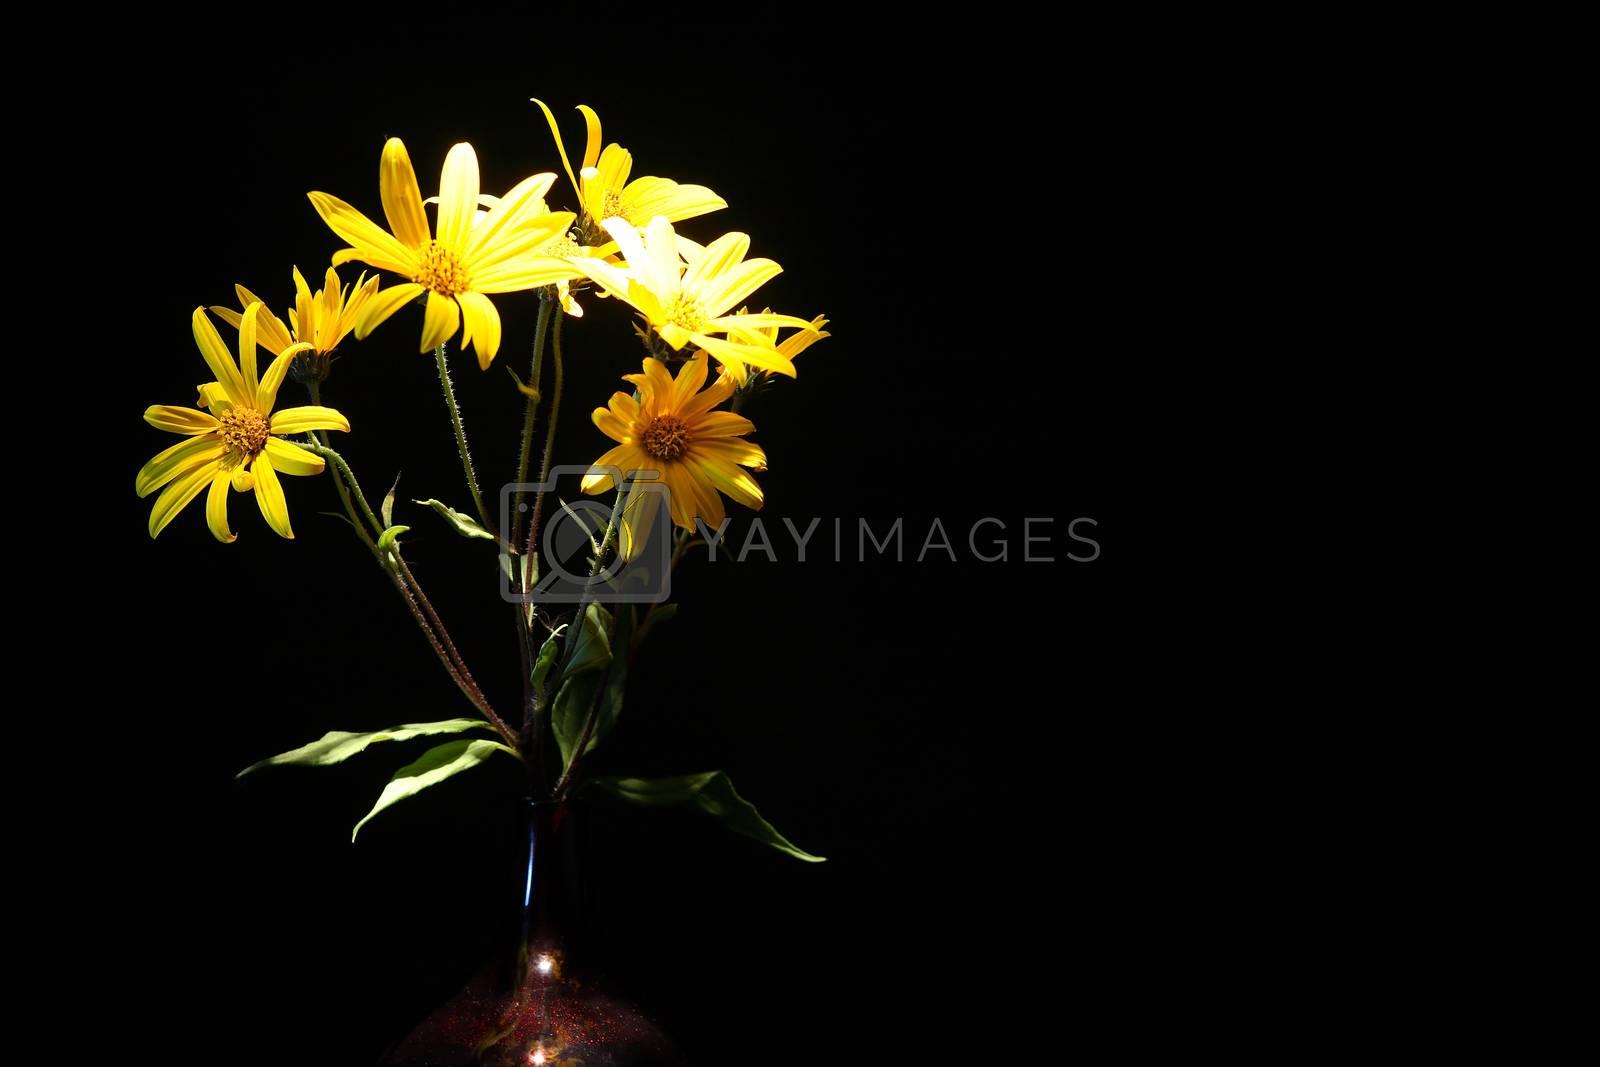 Royalty free image of Yellow On Black by kvkirillov